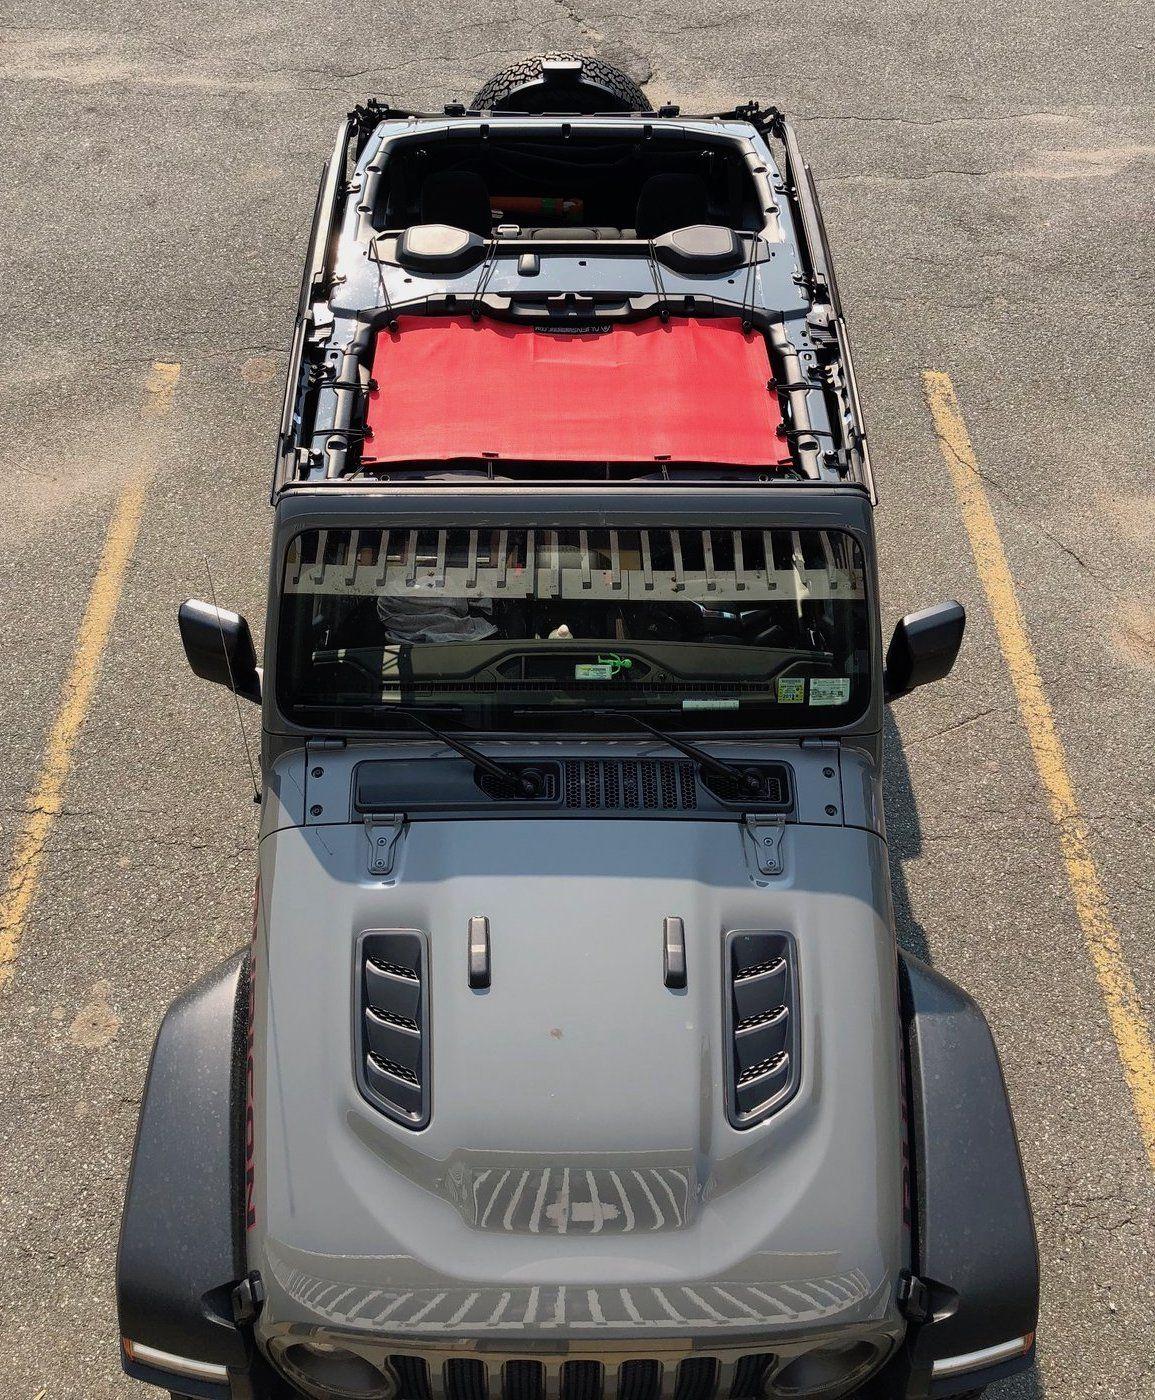 Details Here Https Dantuckerautos Com Elegant Jeep Wrangler Unlimited Soft Top In 2020 Jeep Wrangler Wrangler Jl Jeep Jl